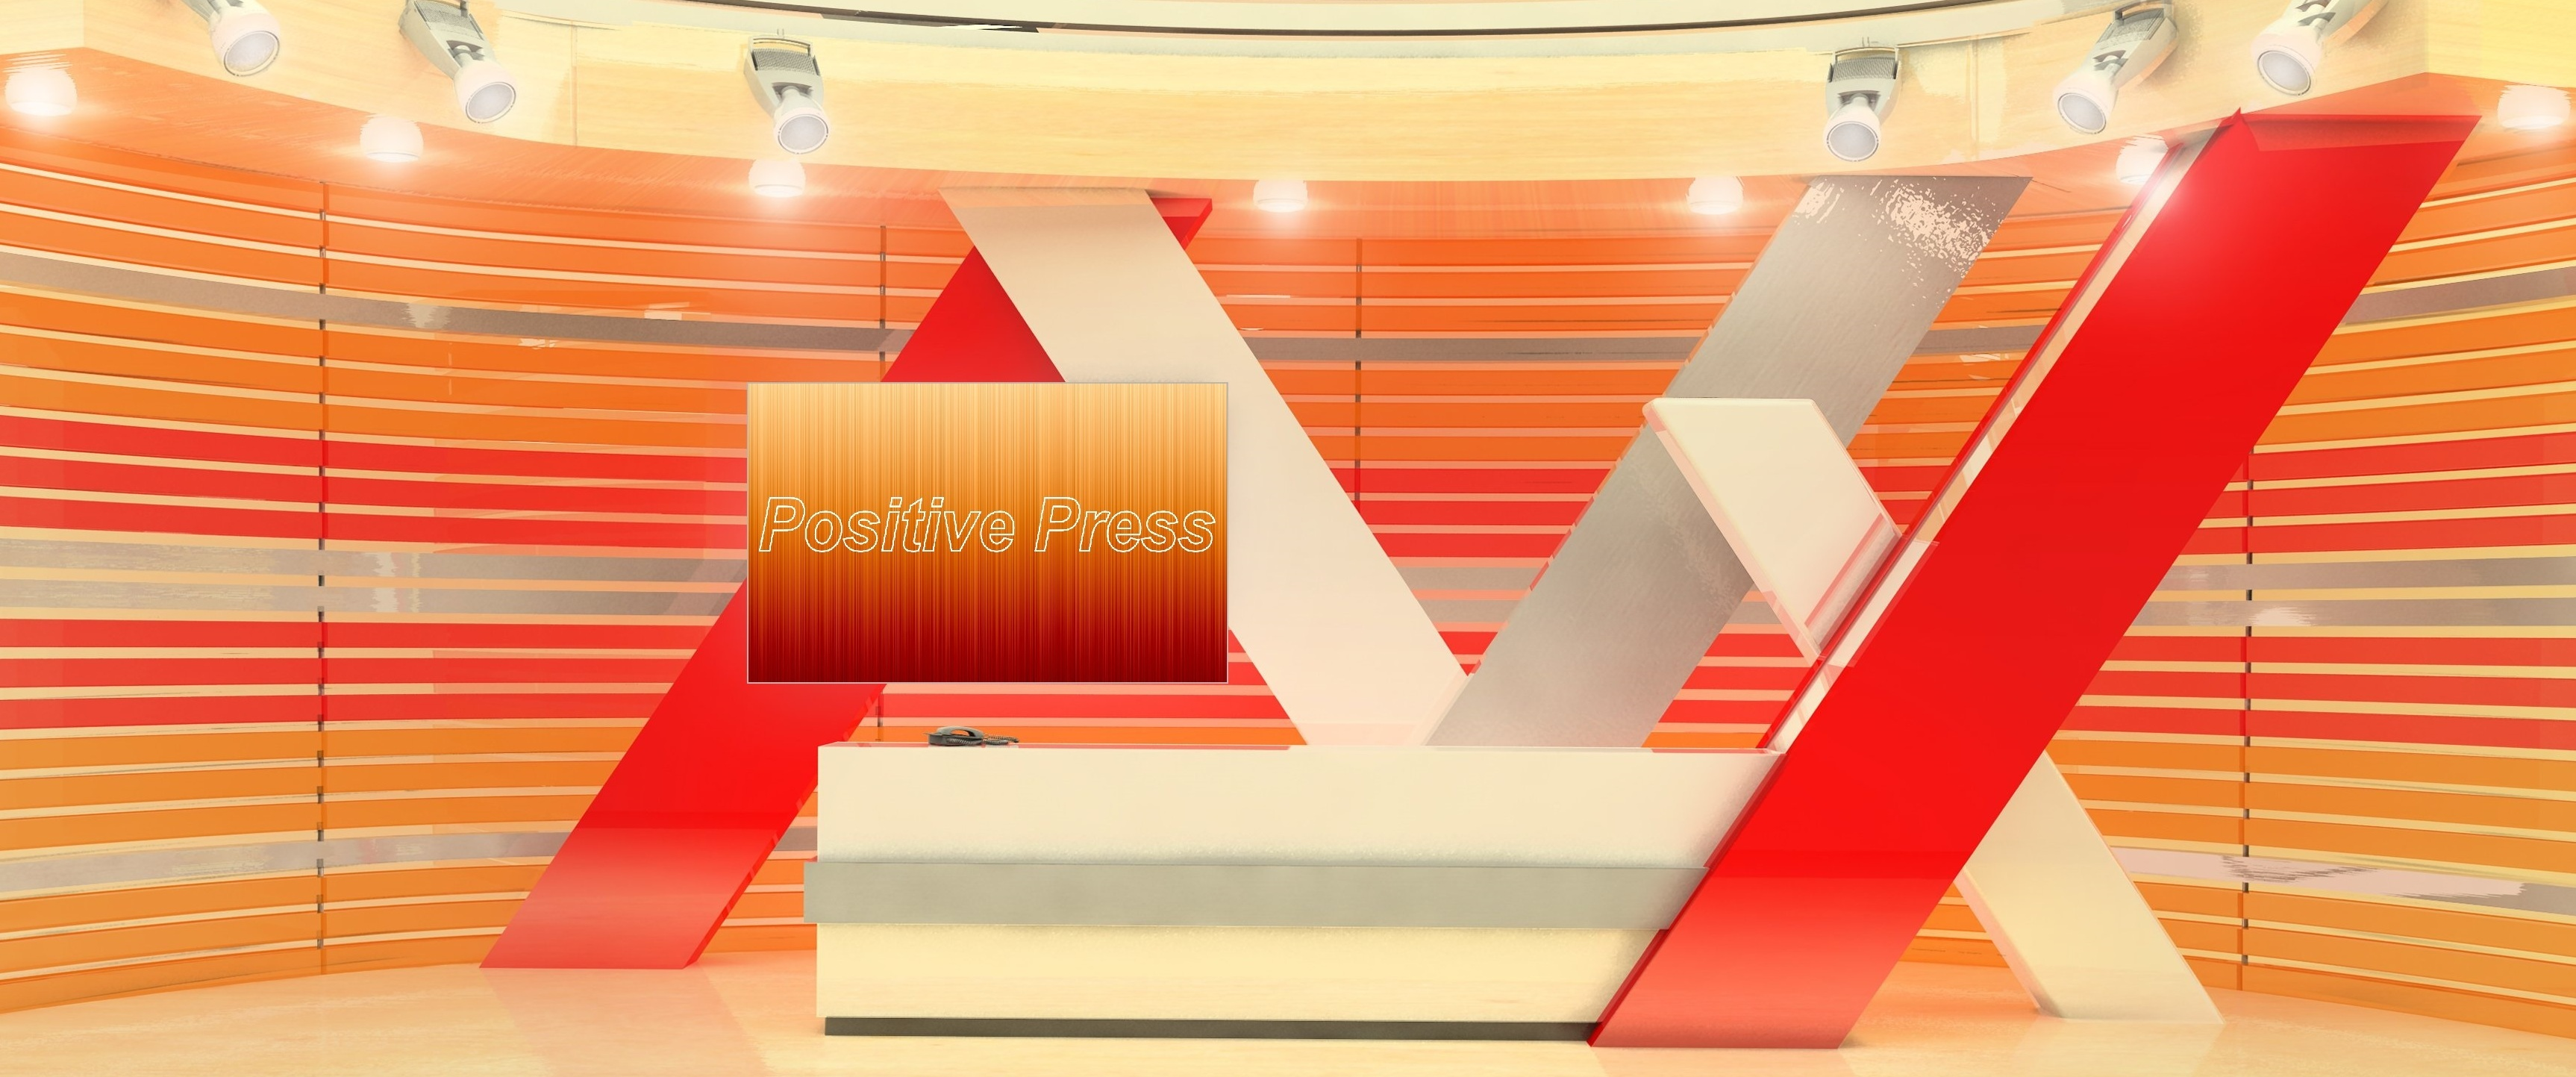 Positive Press